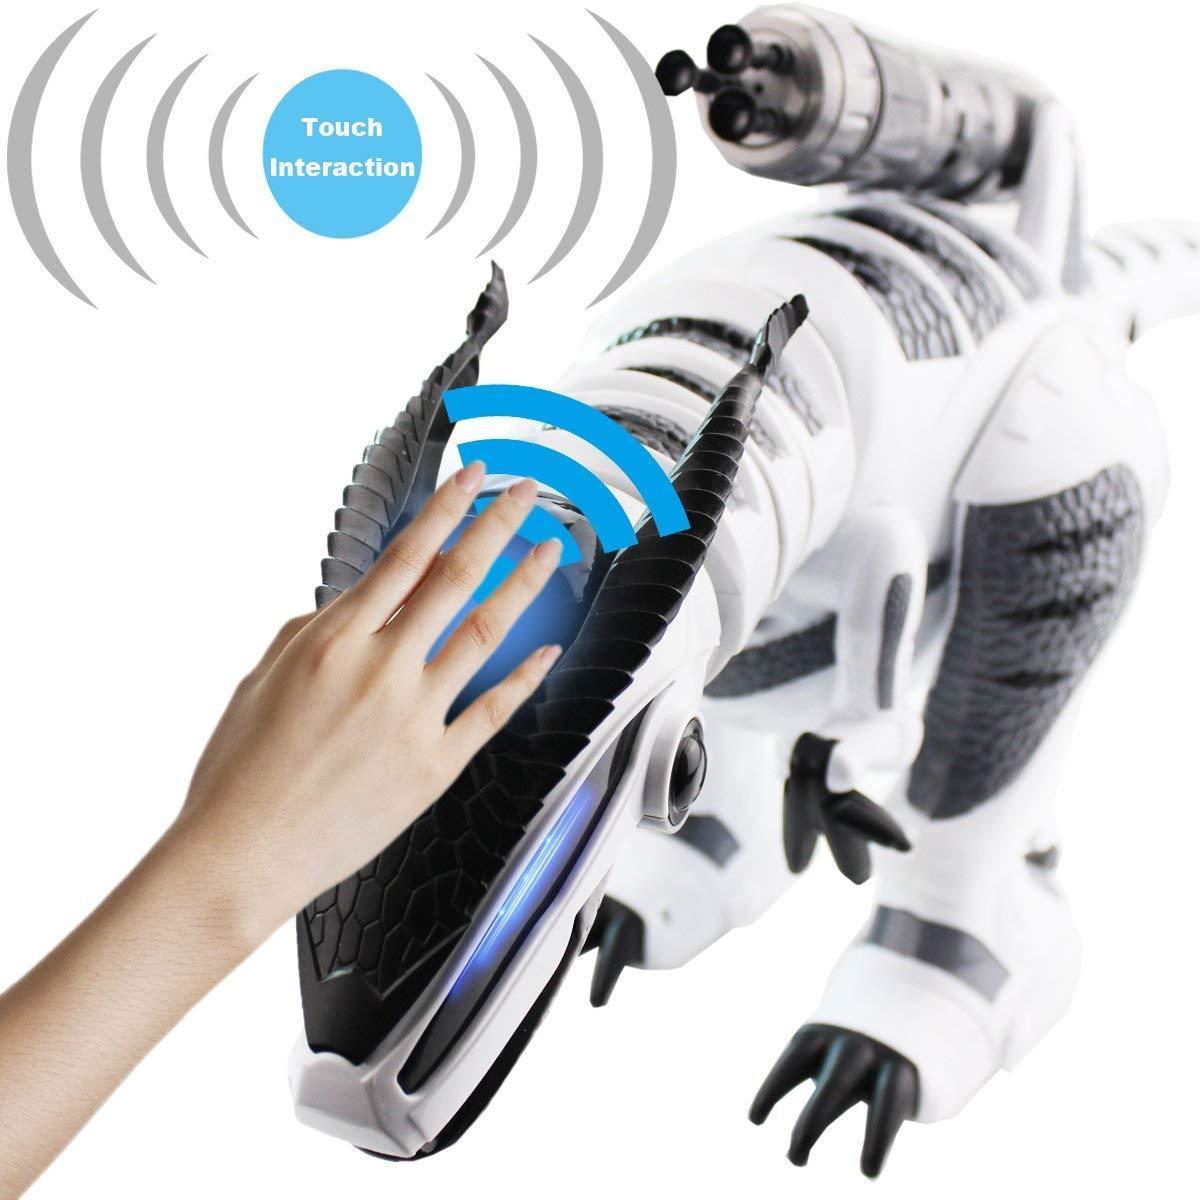 Dinosaur Toys RC Robot Intelligent Interactive Smart Walking Dancing Singing Electronic Pets Education Kids Toys white